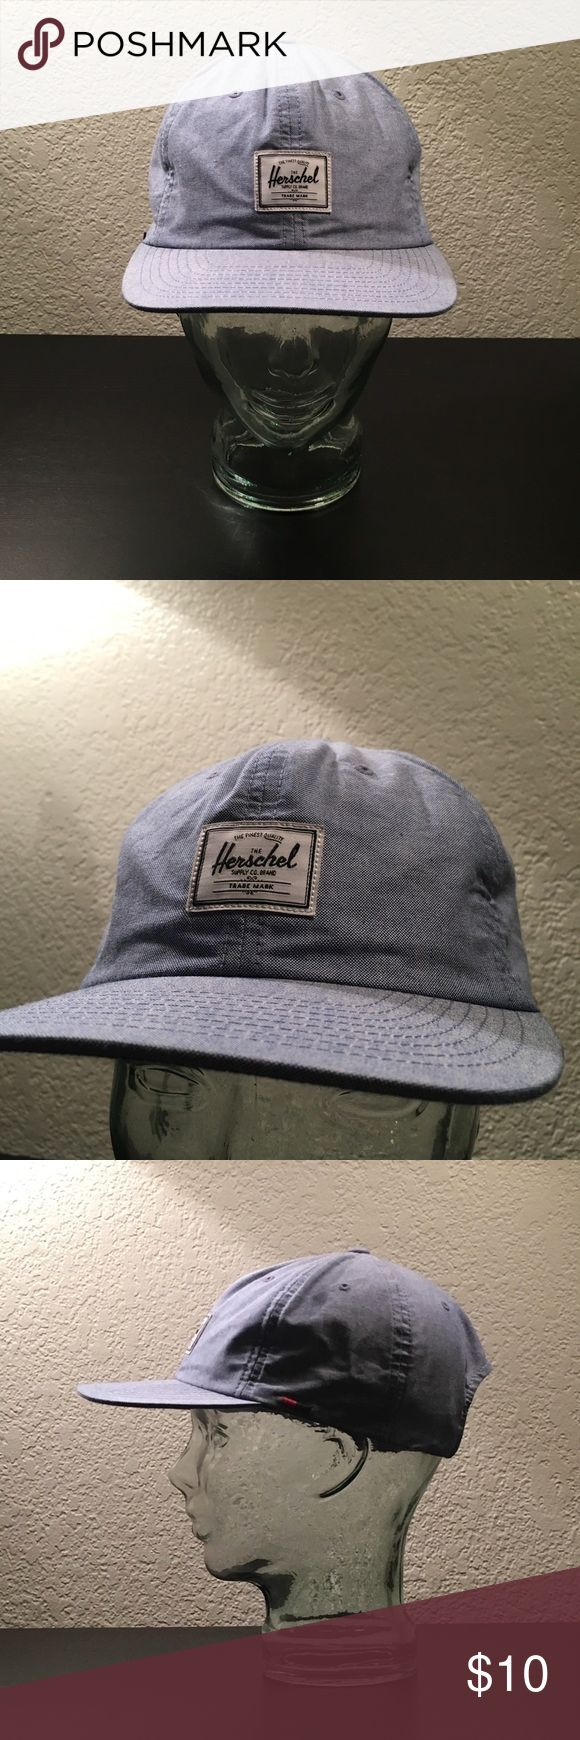 Strapback Cap by Herschel Supply Company. OS. Strapback Cap by Herschel Supply Company. OS. Phenomenal condition! Herschel Supply Company Accessories Hats